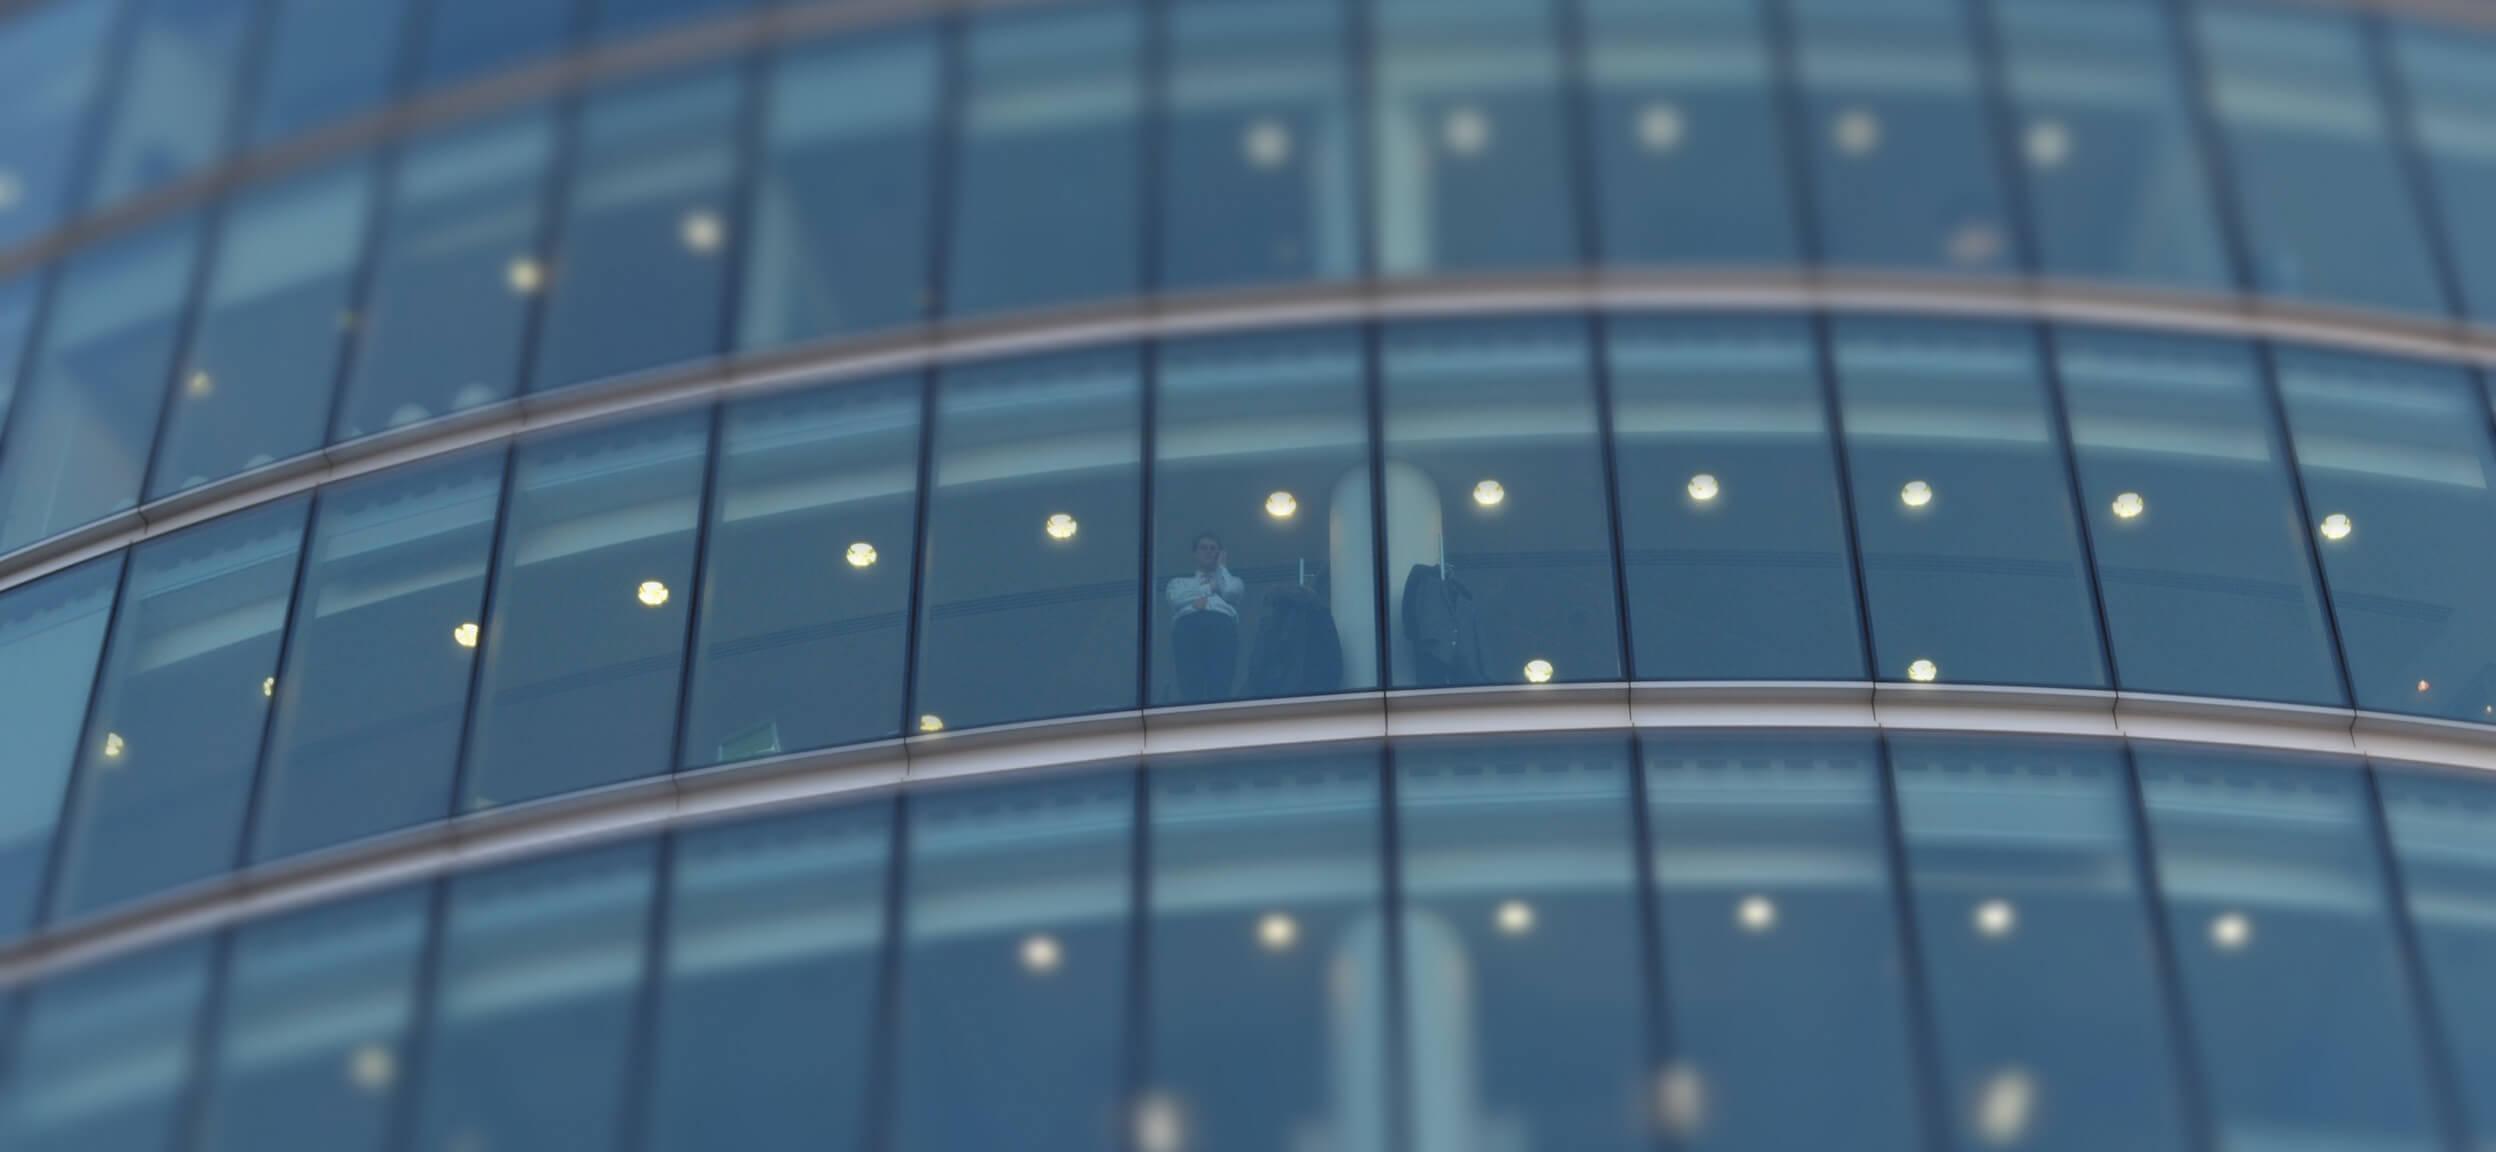 Leverage market intelligence platform to track negative news